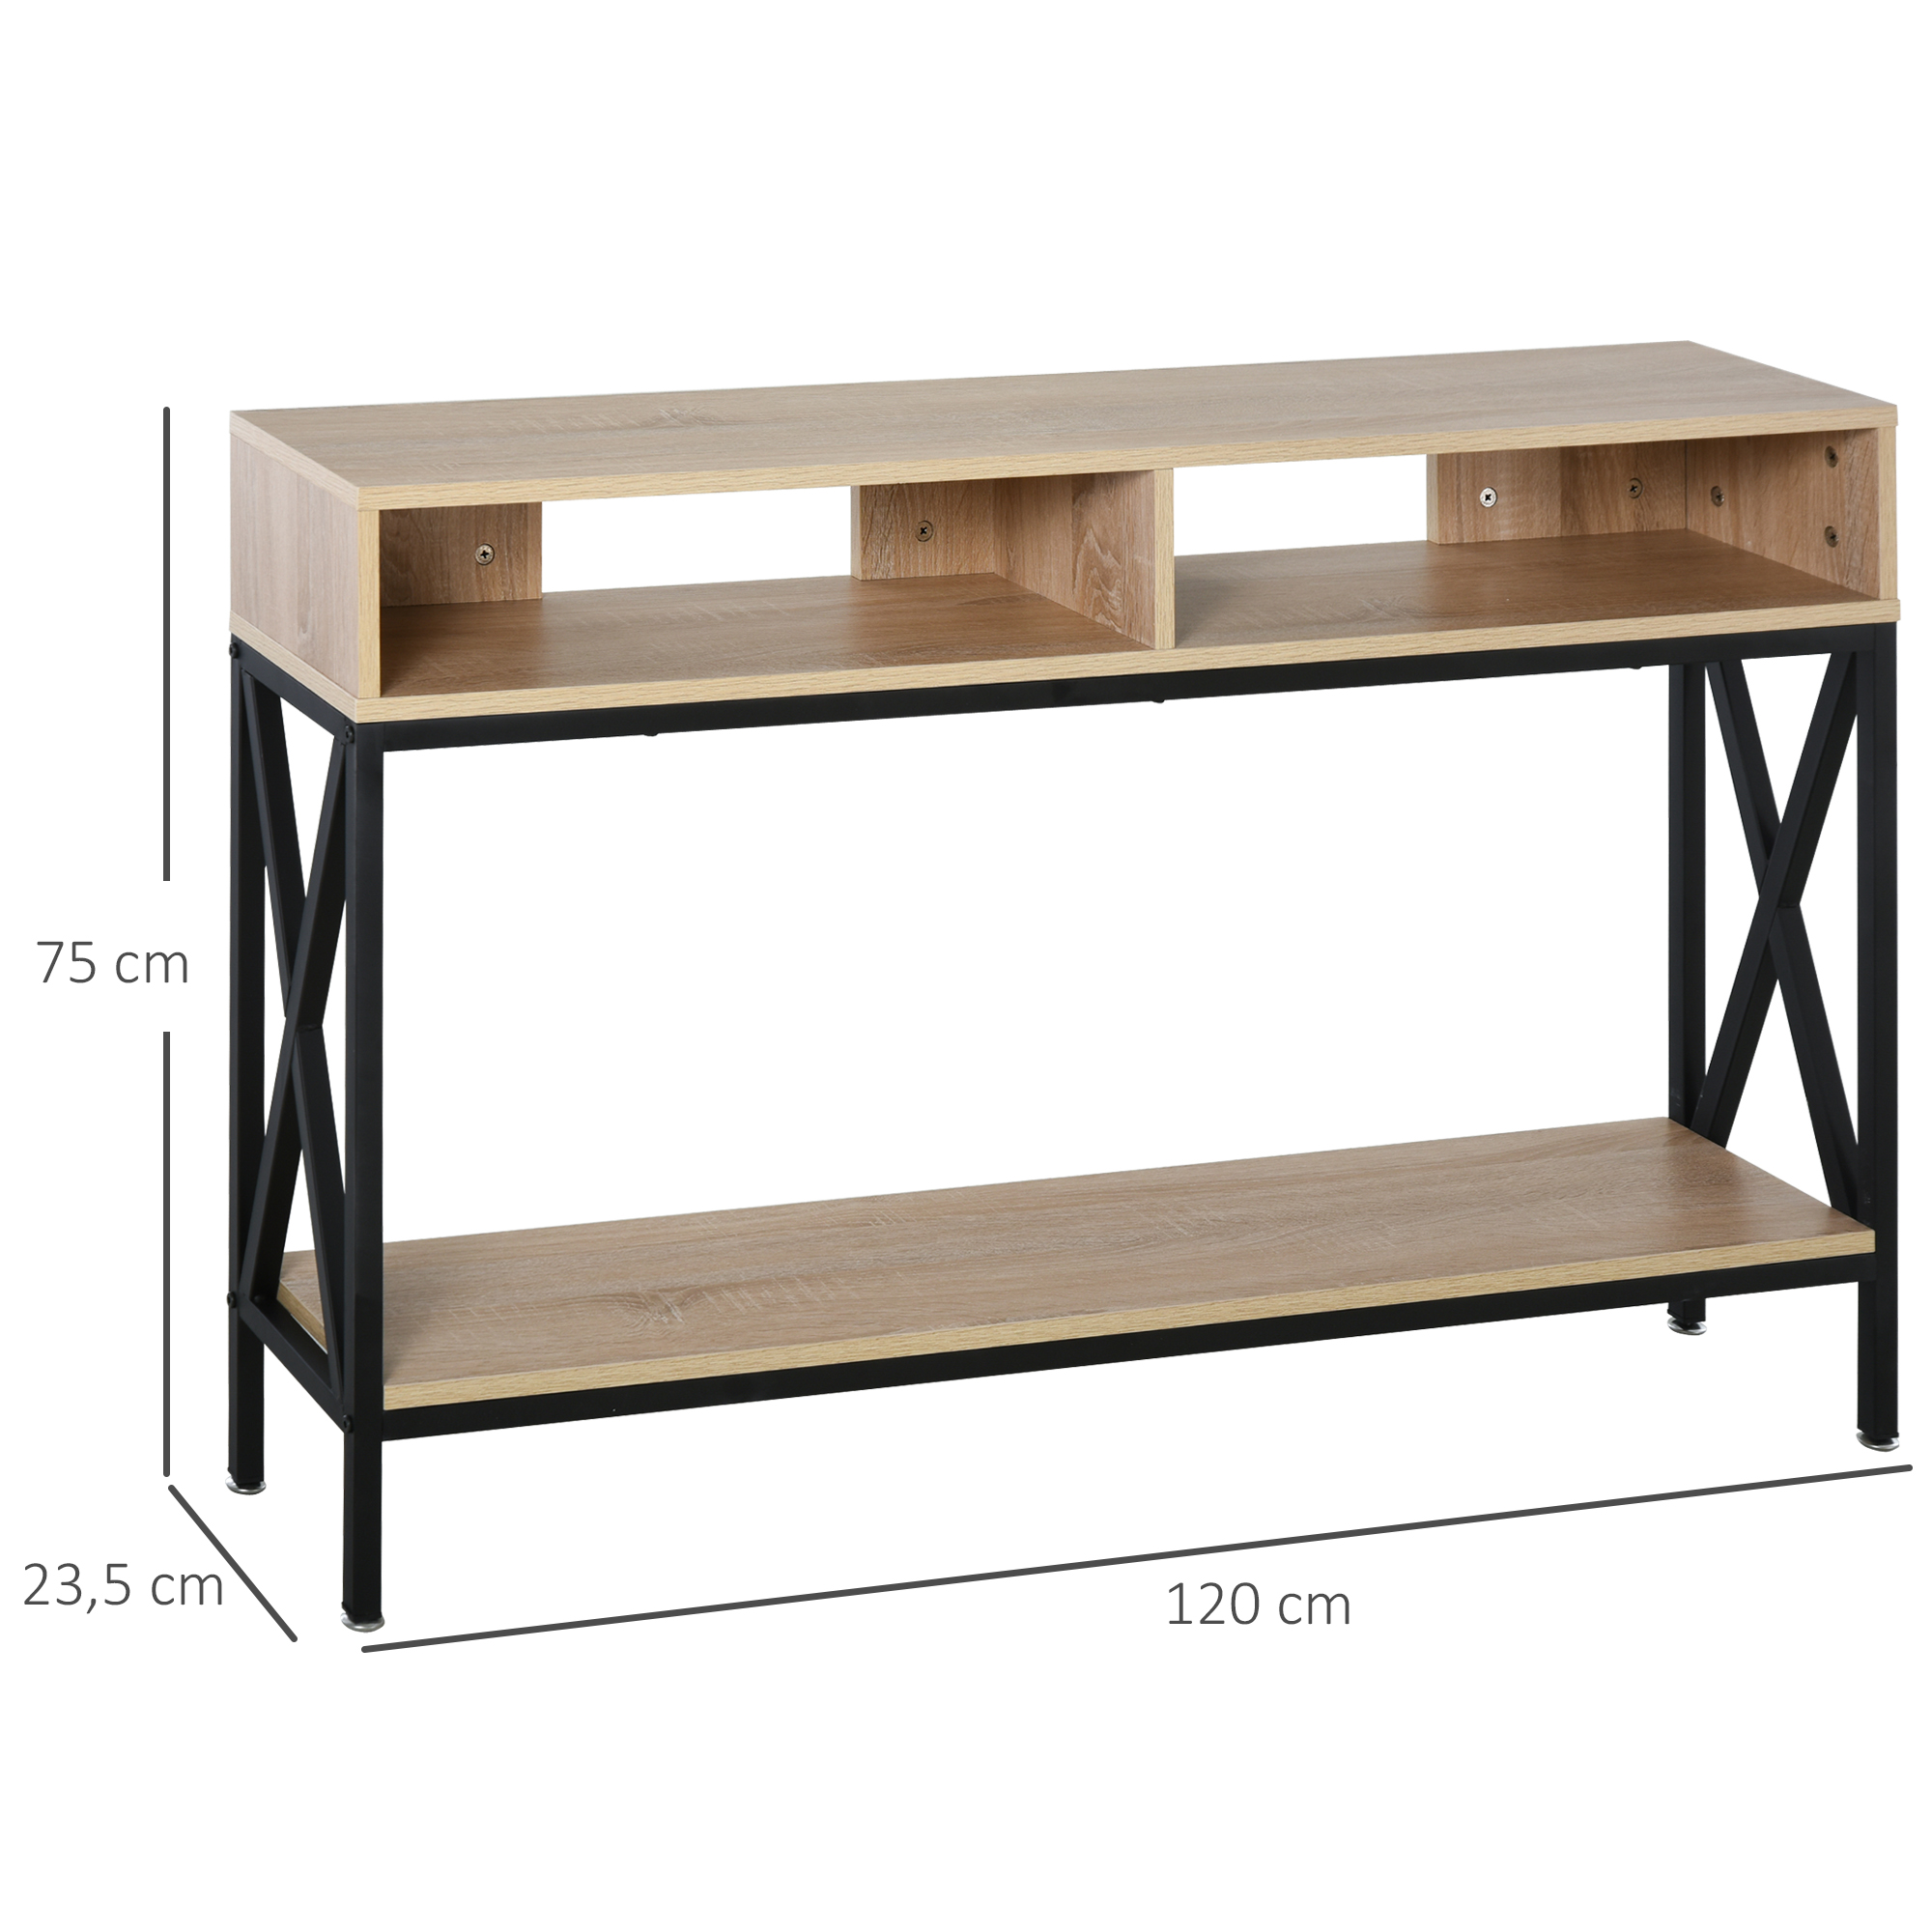 Table console industriel